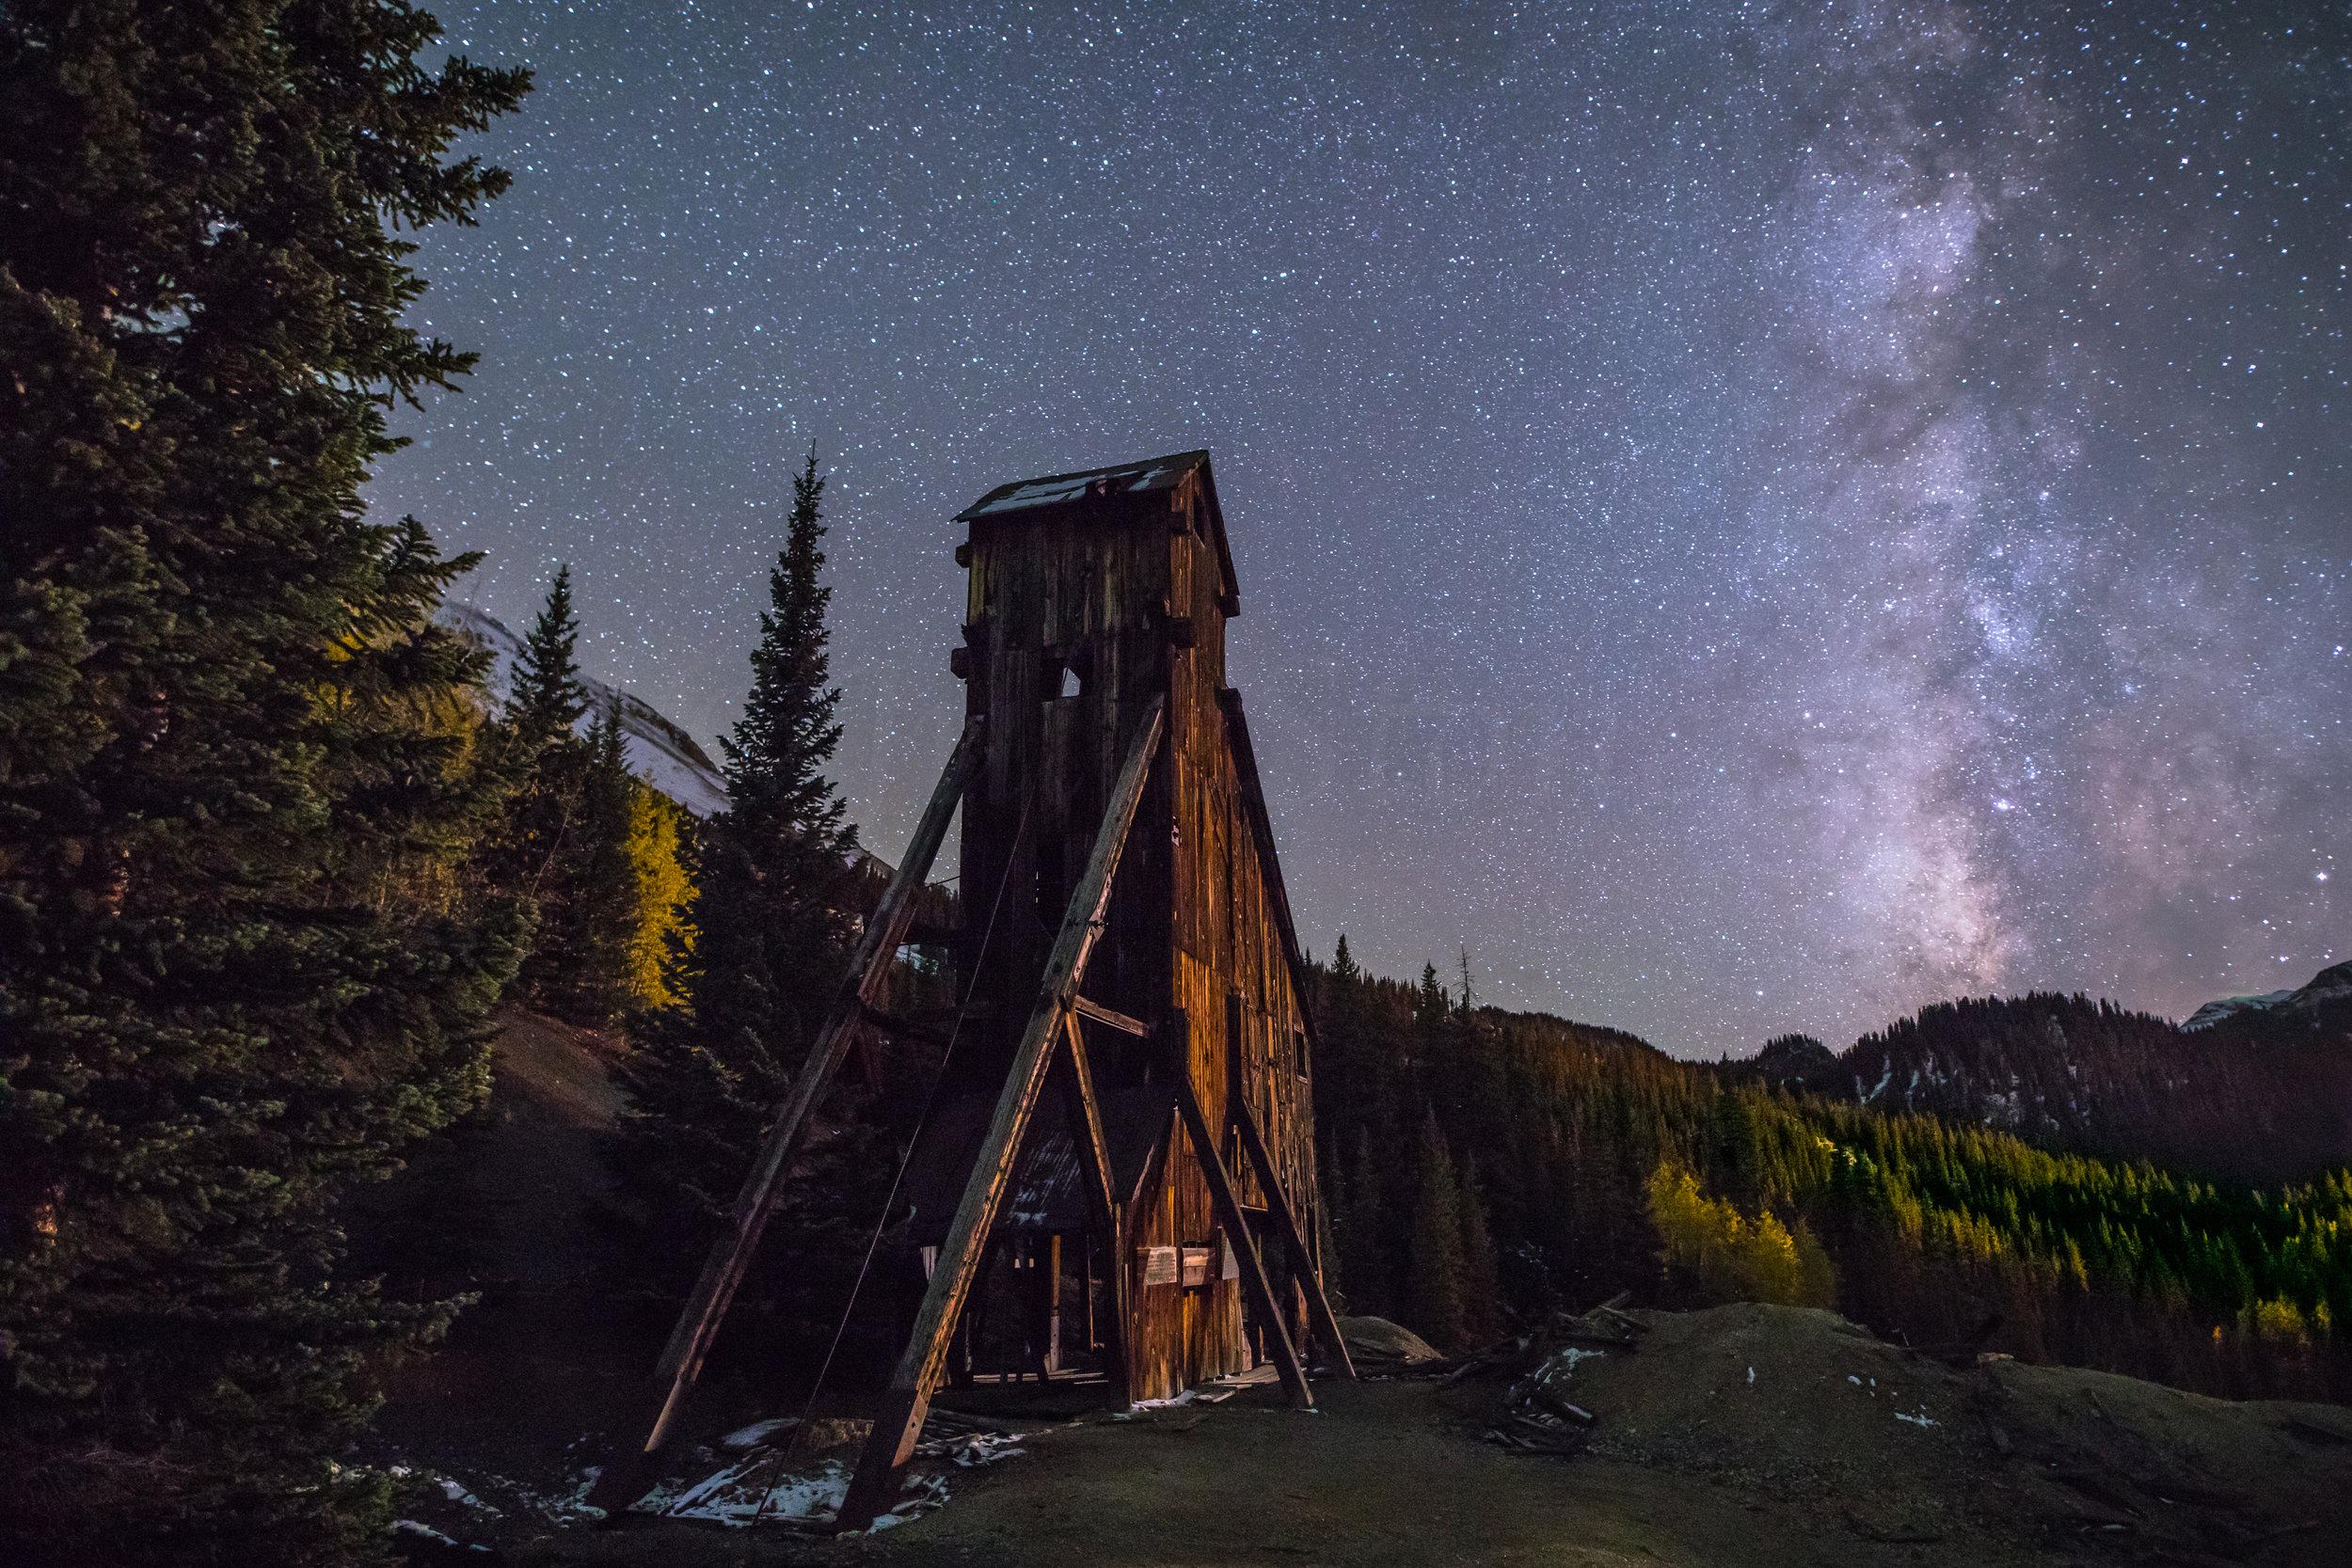 Milky way over Yankee Girl Mine, Image # 5551